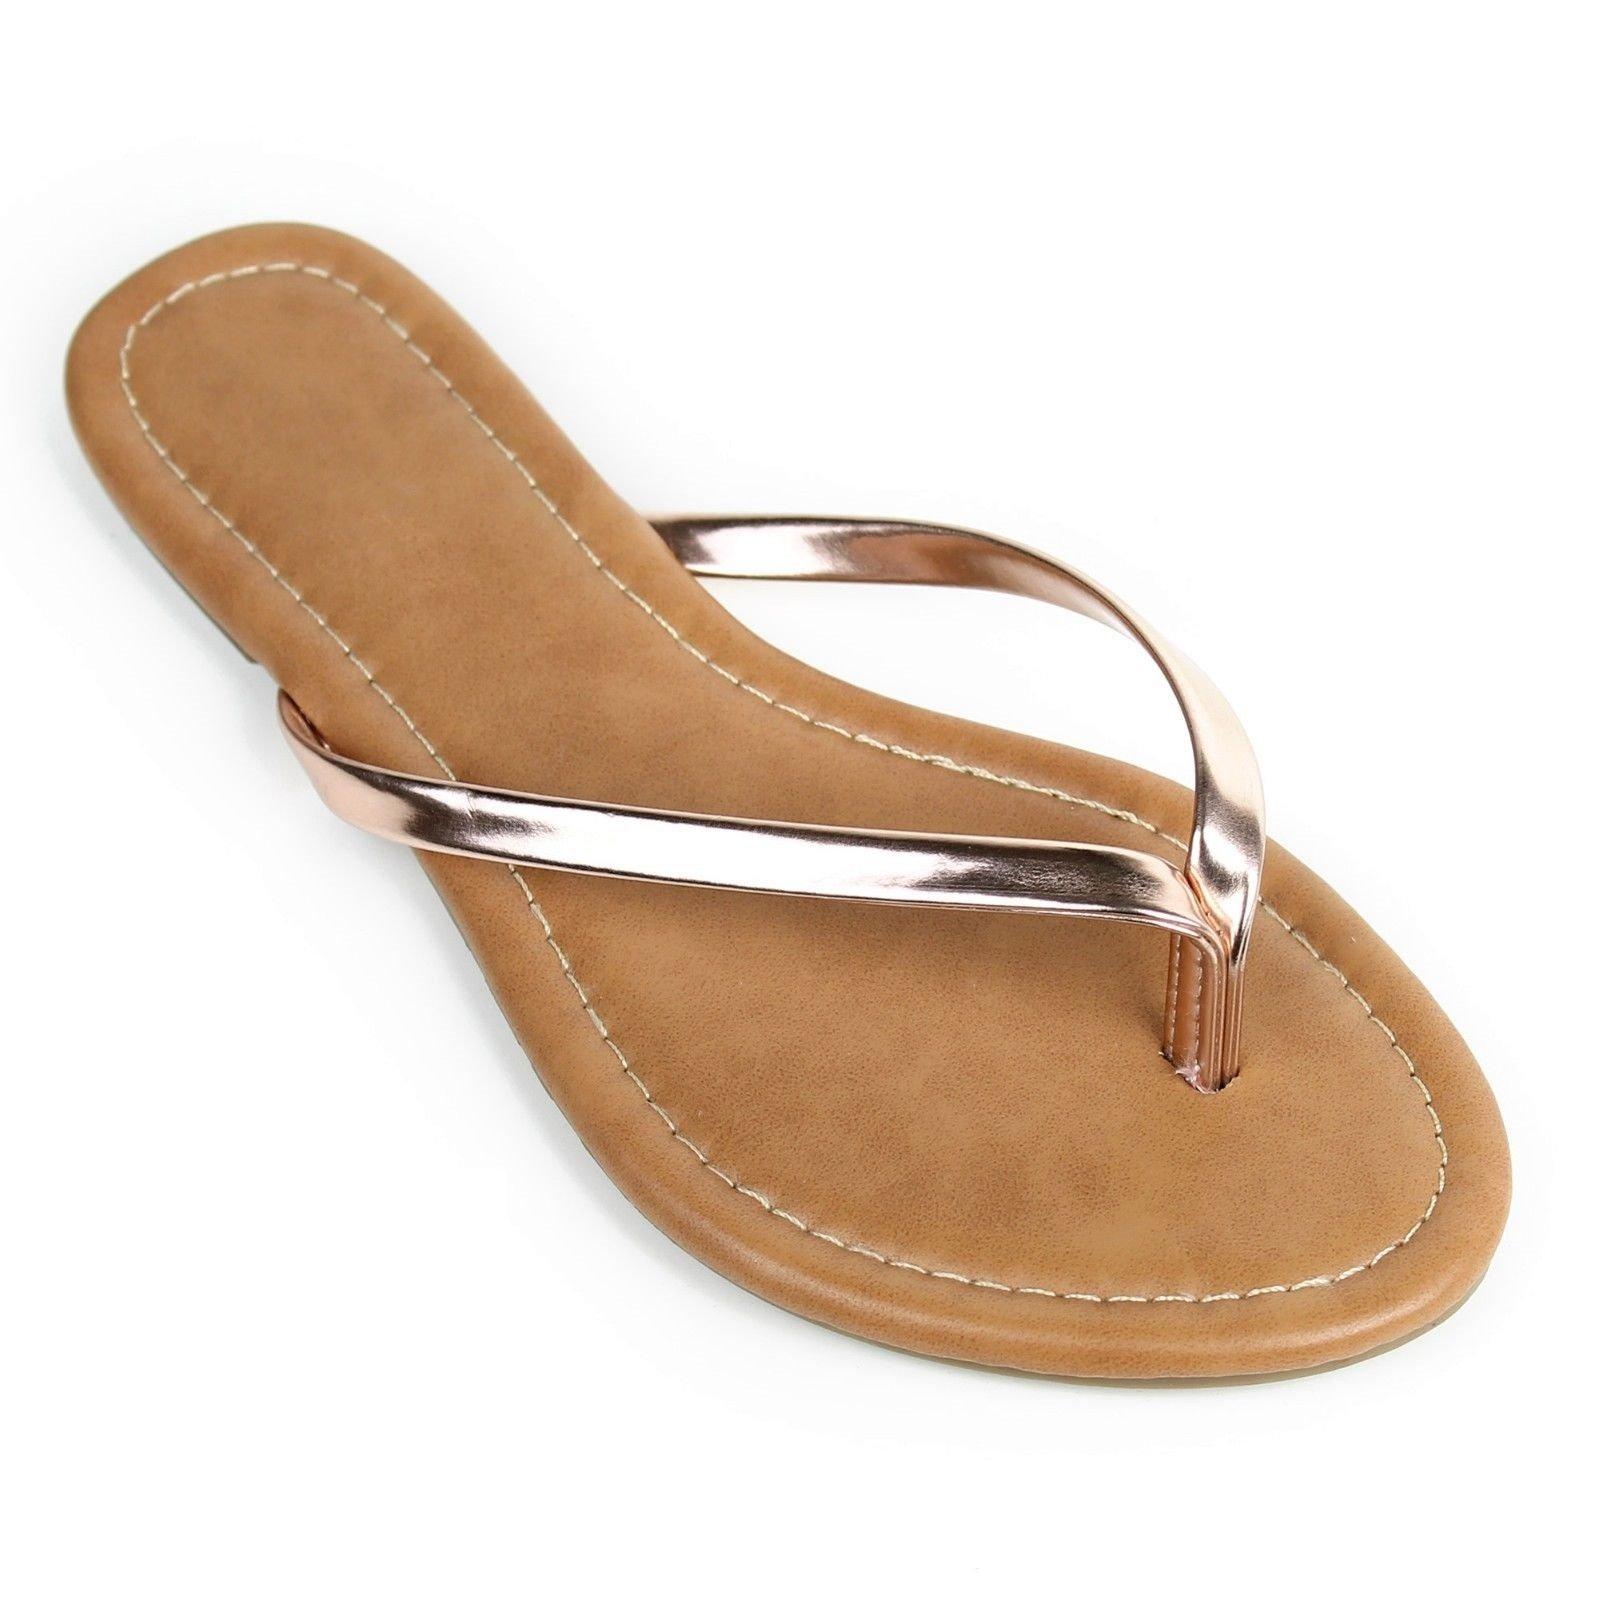 Red Circle Women's Summer Flat Flip Flops Slip On Sandals Shoes (10, Rose Gold)